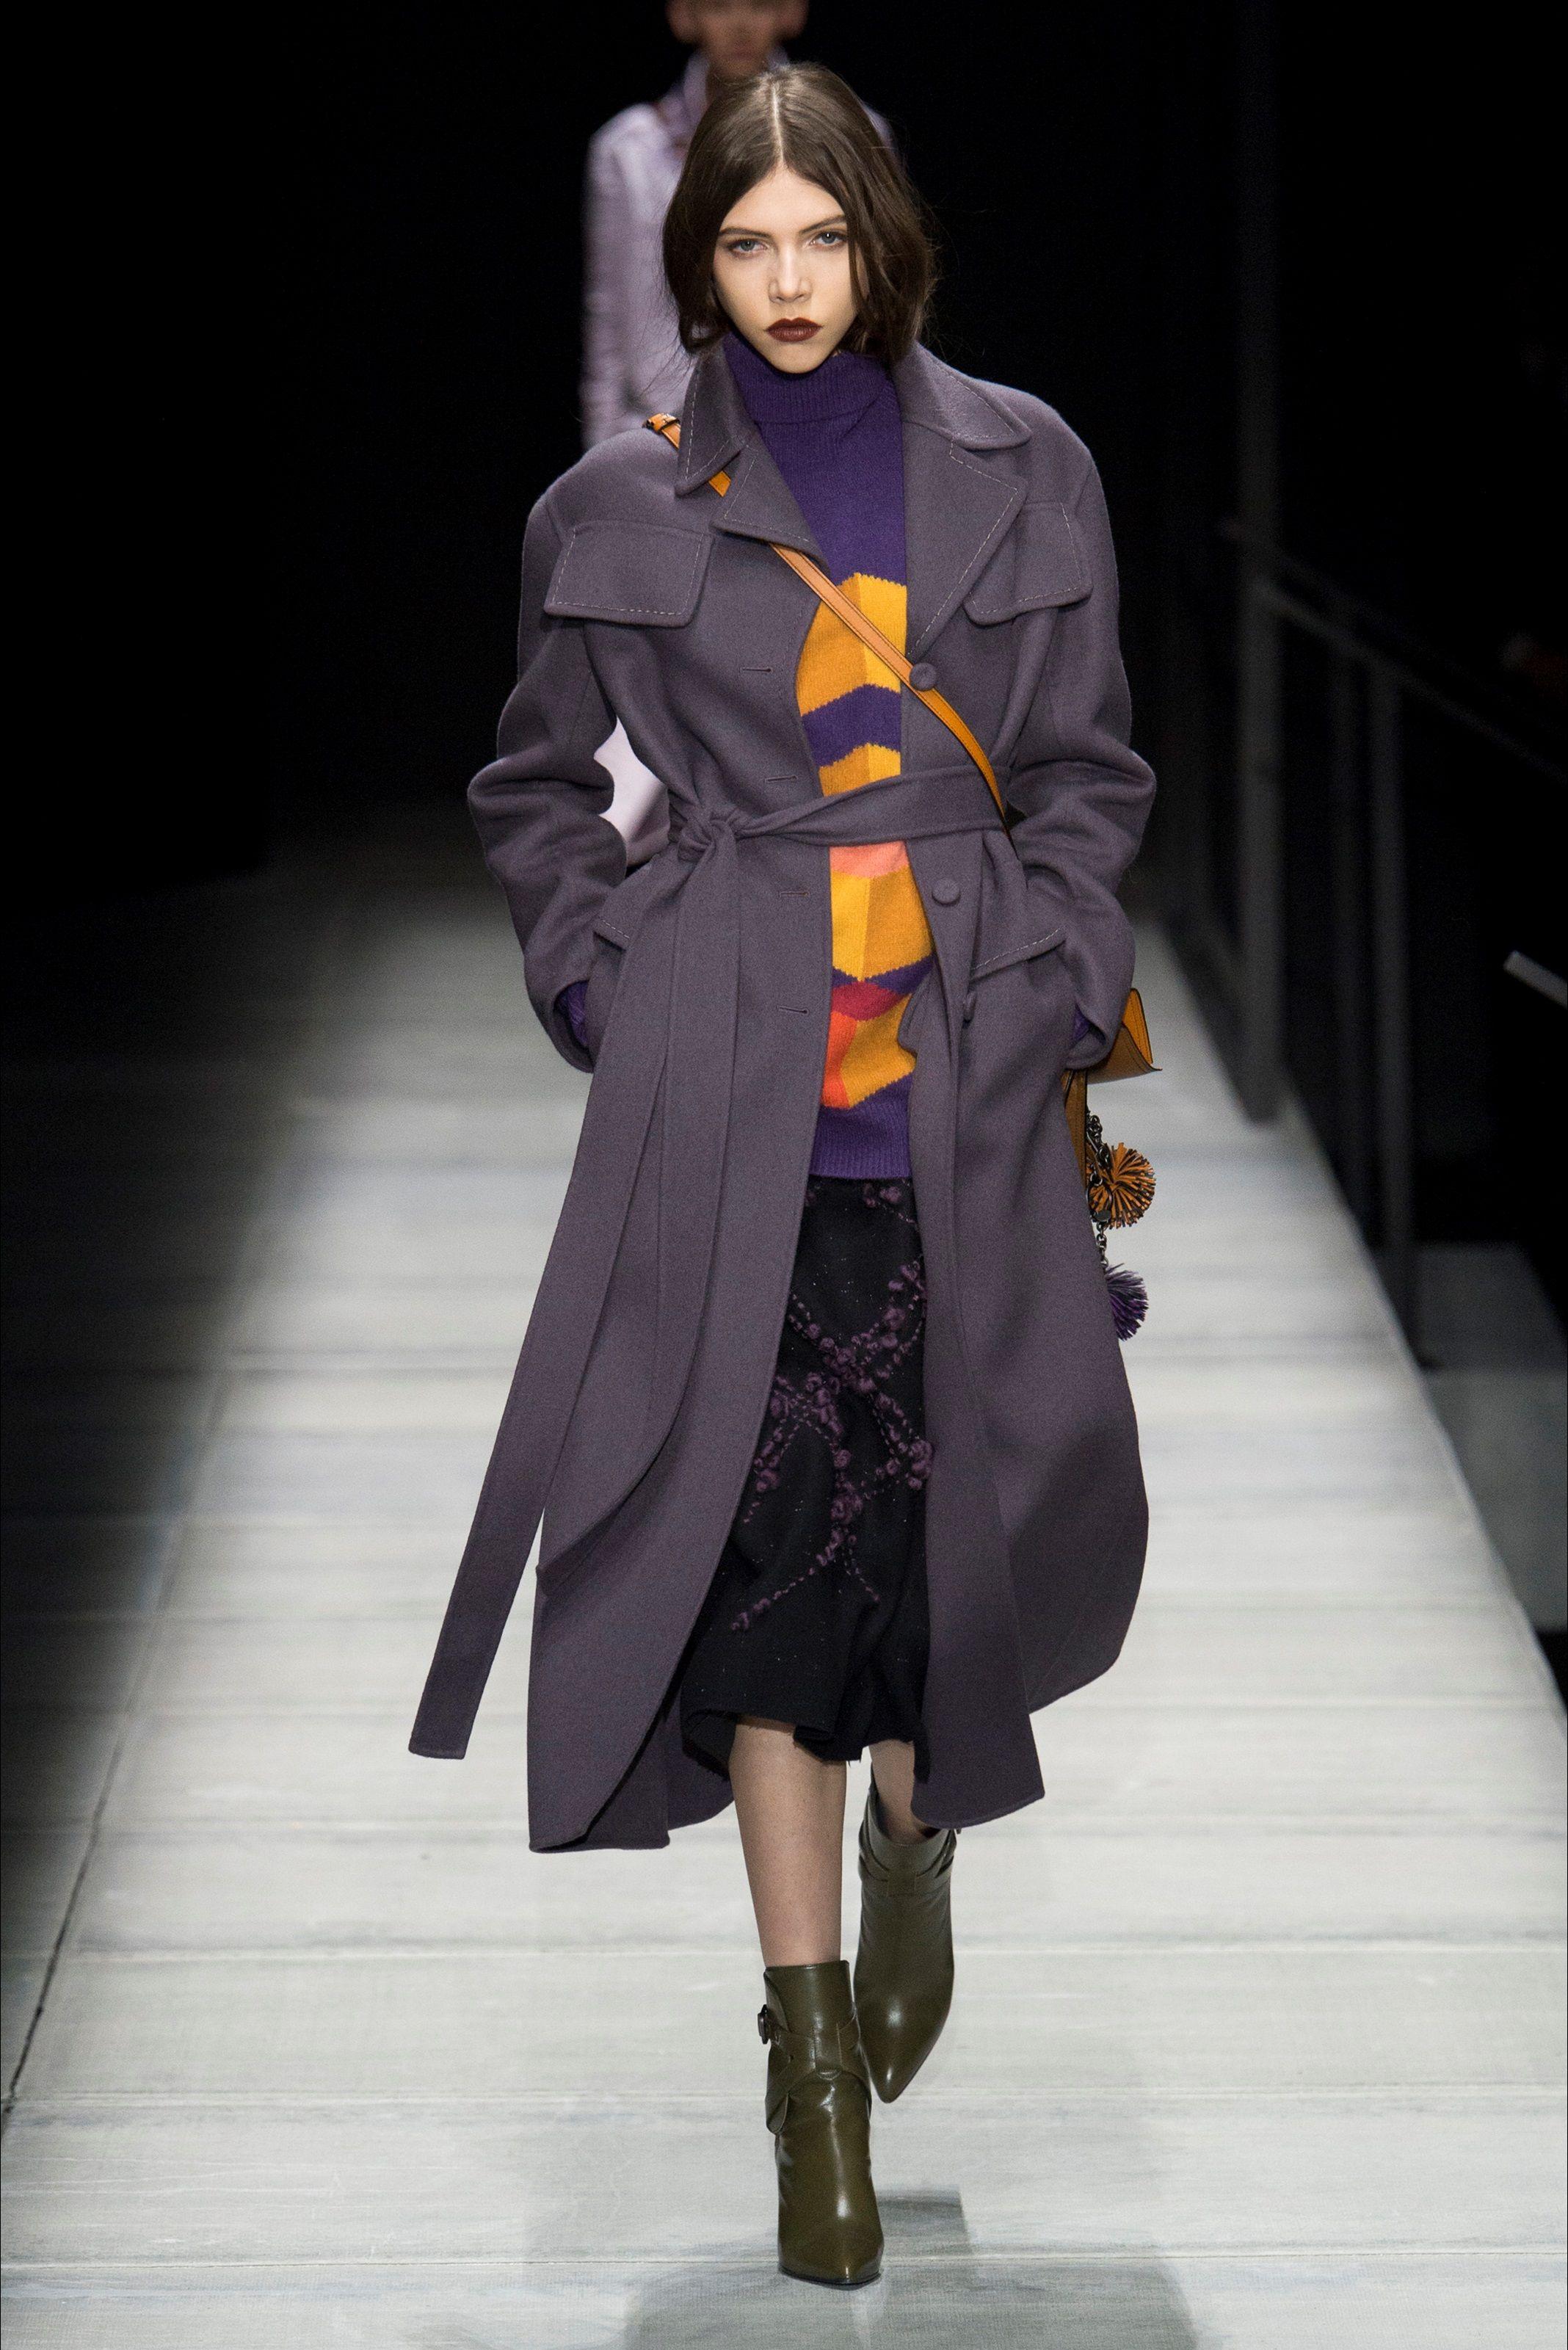 01532425ccc6b0 Sfilata Bottega Veneta New York - Collezioni Autunno Inverno 2018-19 - Vogue